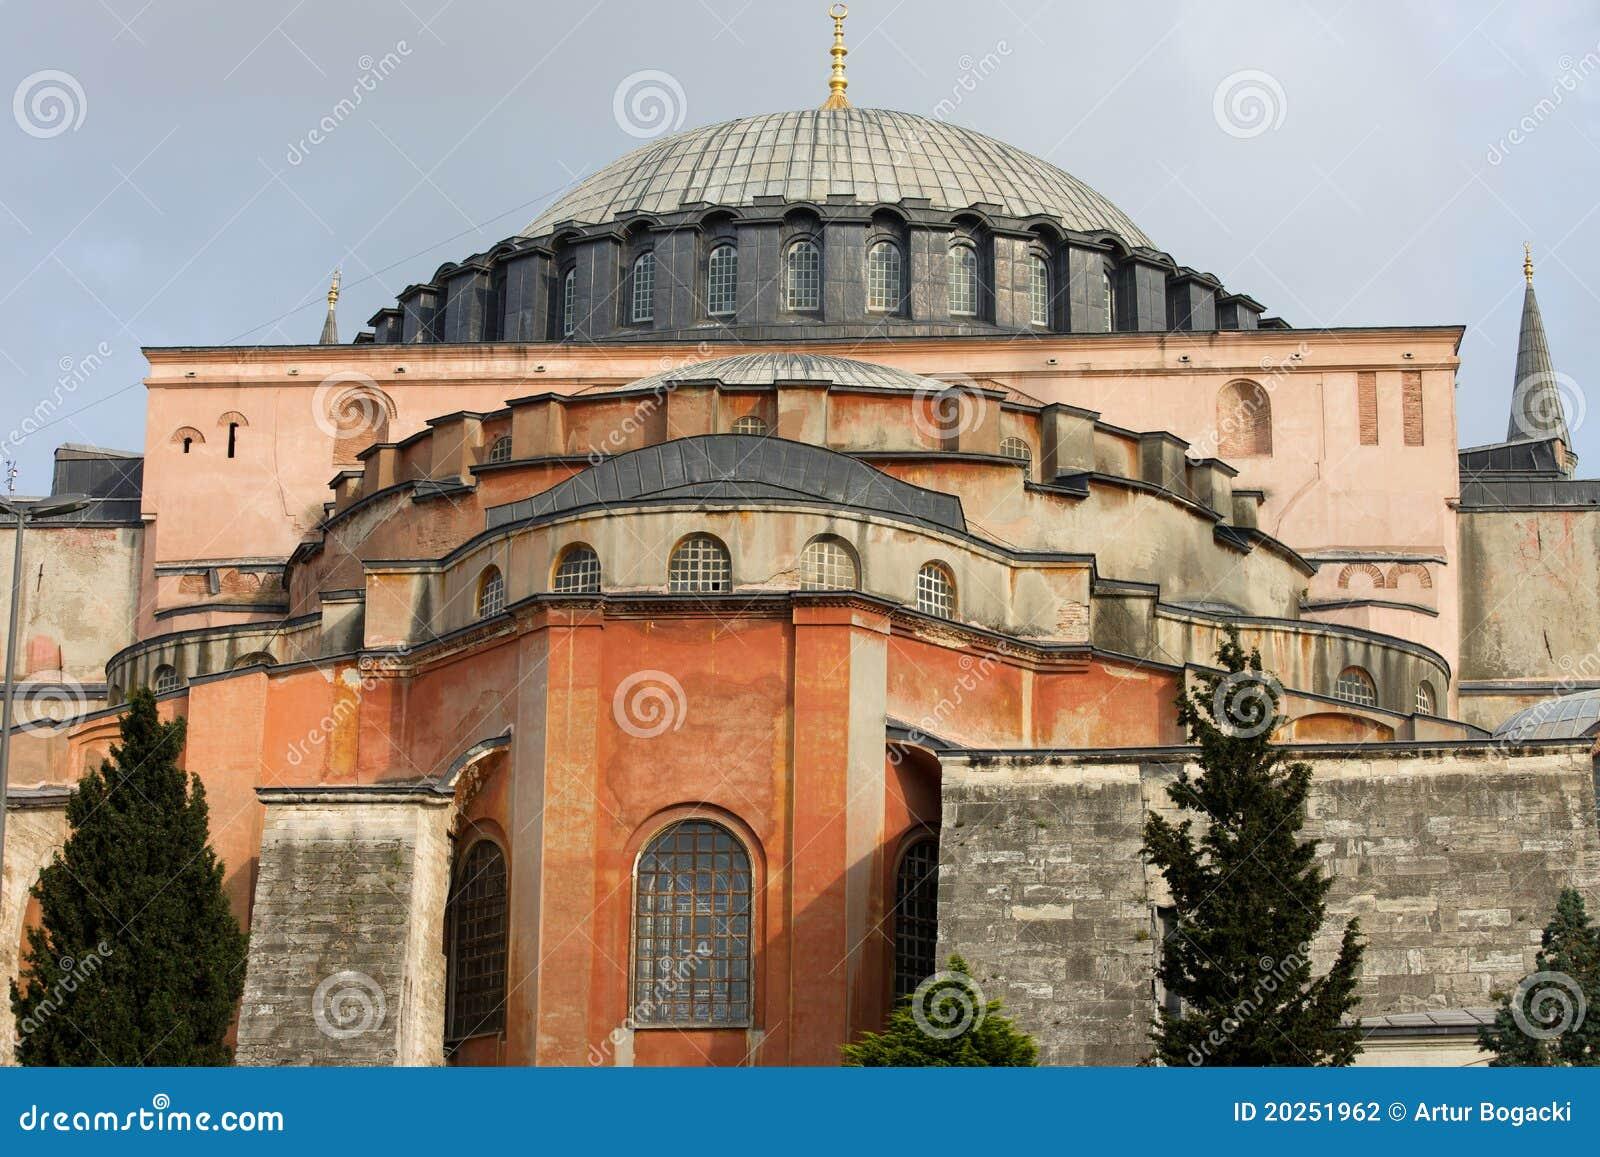 Hagia sophia byzantine architecture stock photography for Architecture byzantine